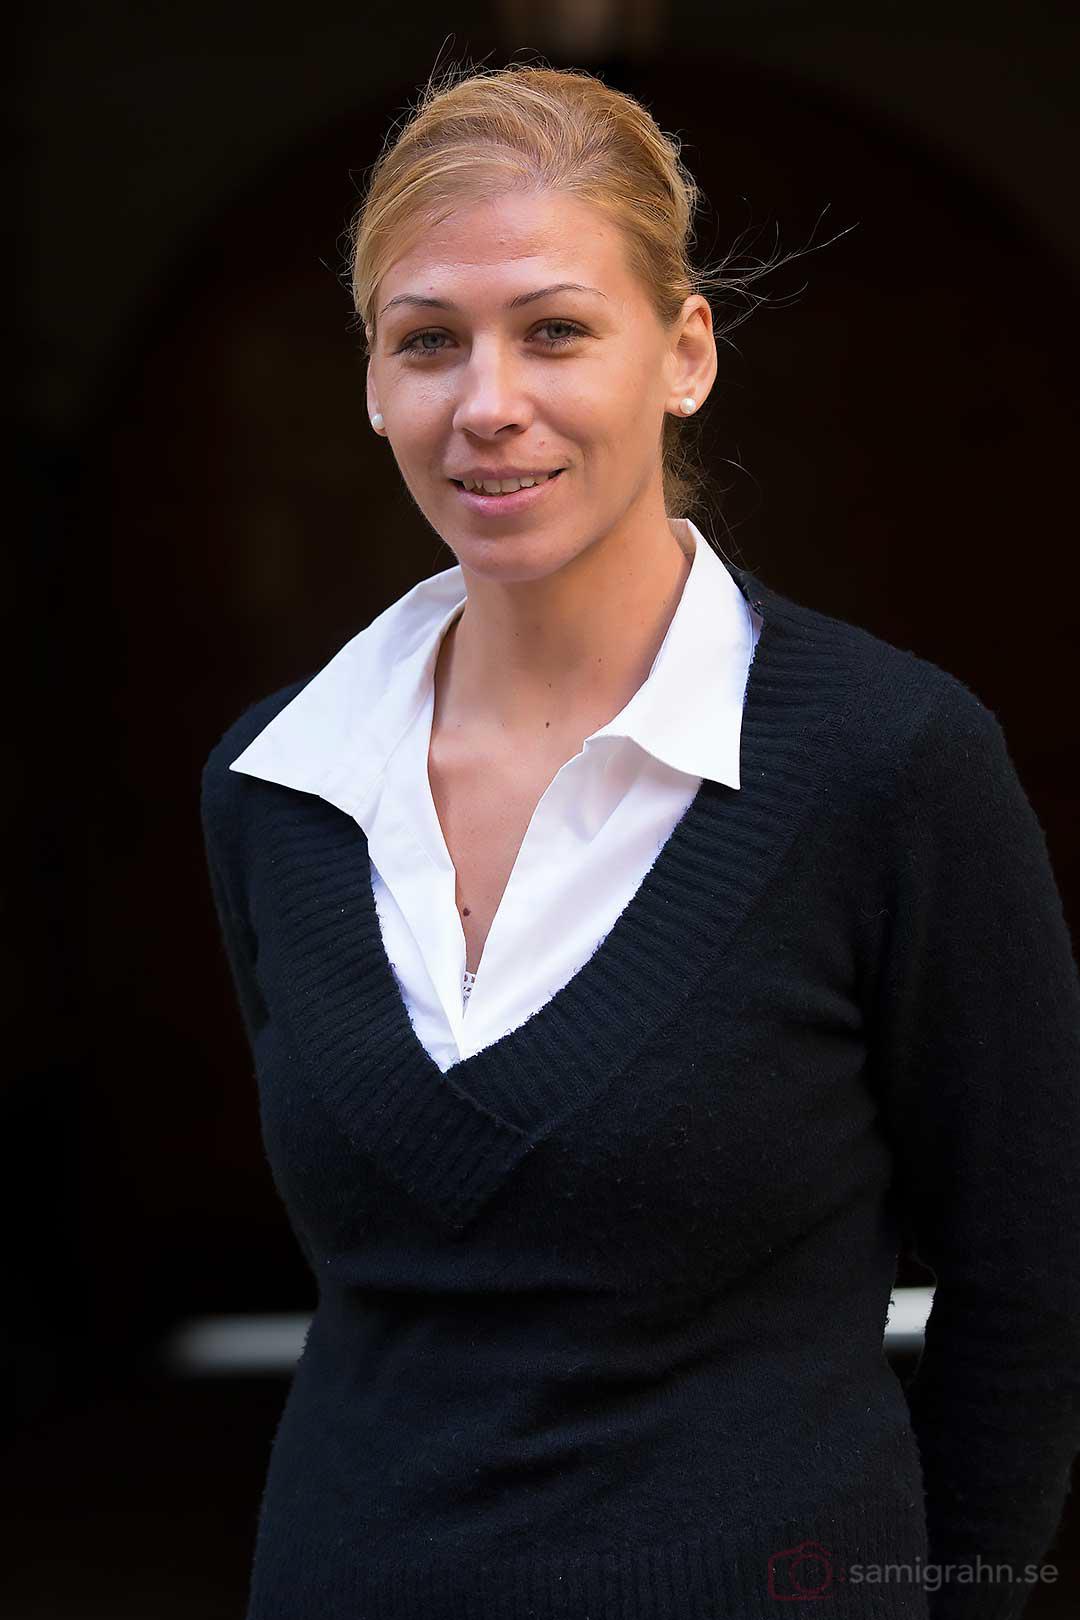 Visby Ladies tränare Tamara Ruzic